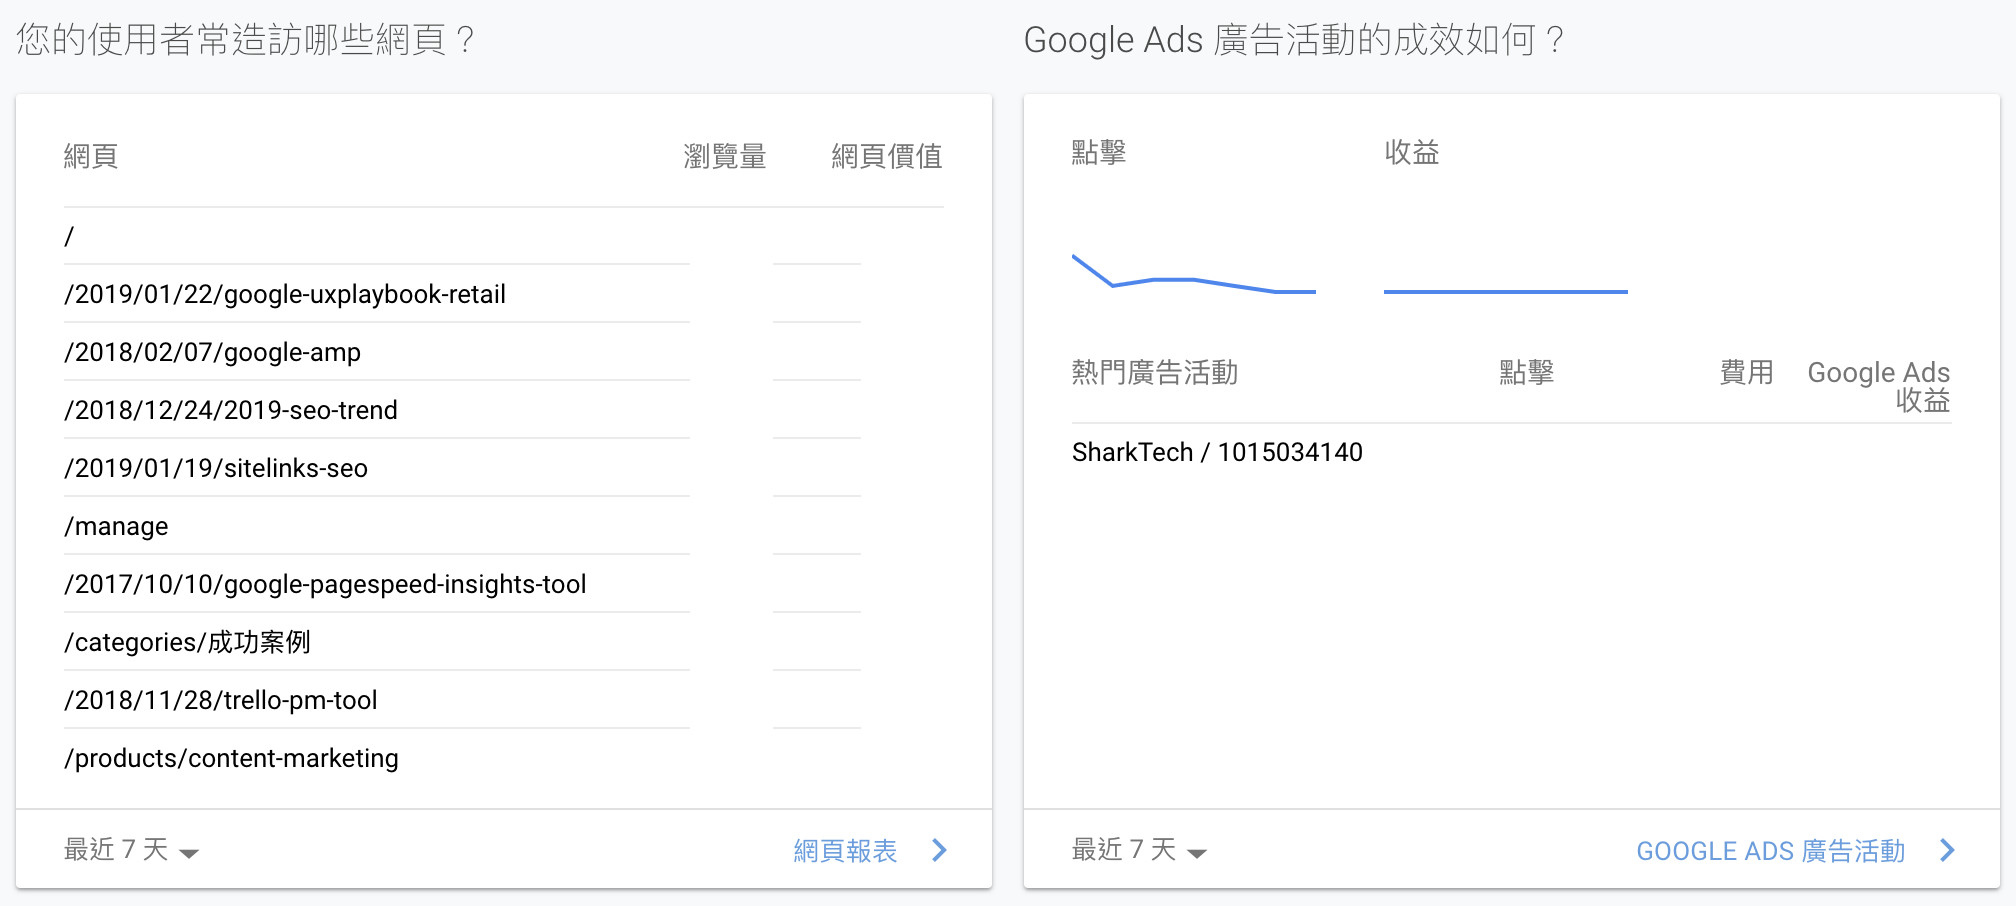 Google Analytics網站流量分析工具熱門瀏覽頁面-鯊客科技網站SEO優化公司